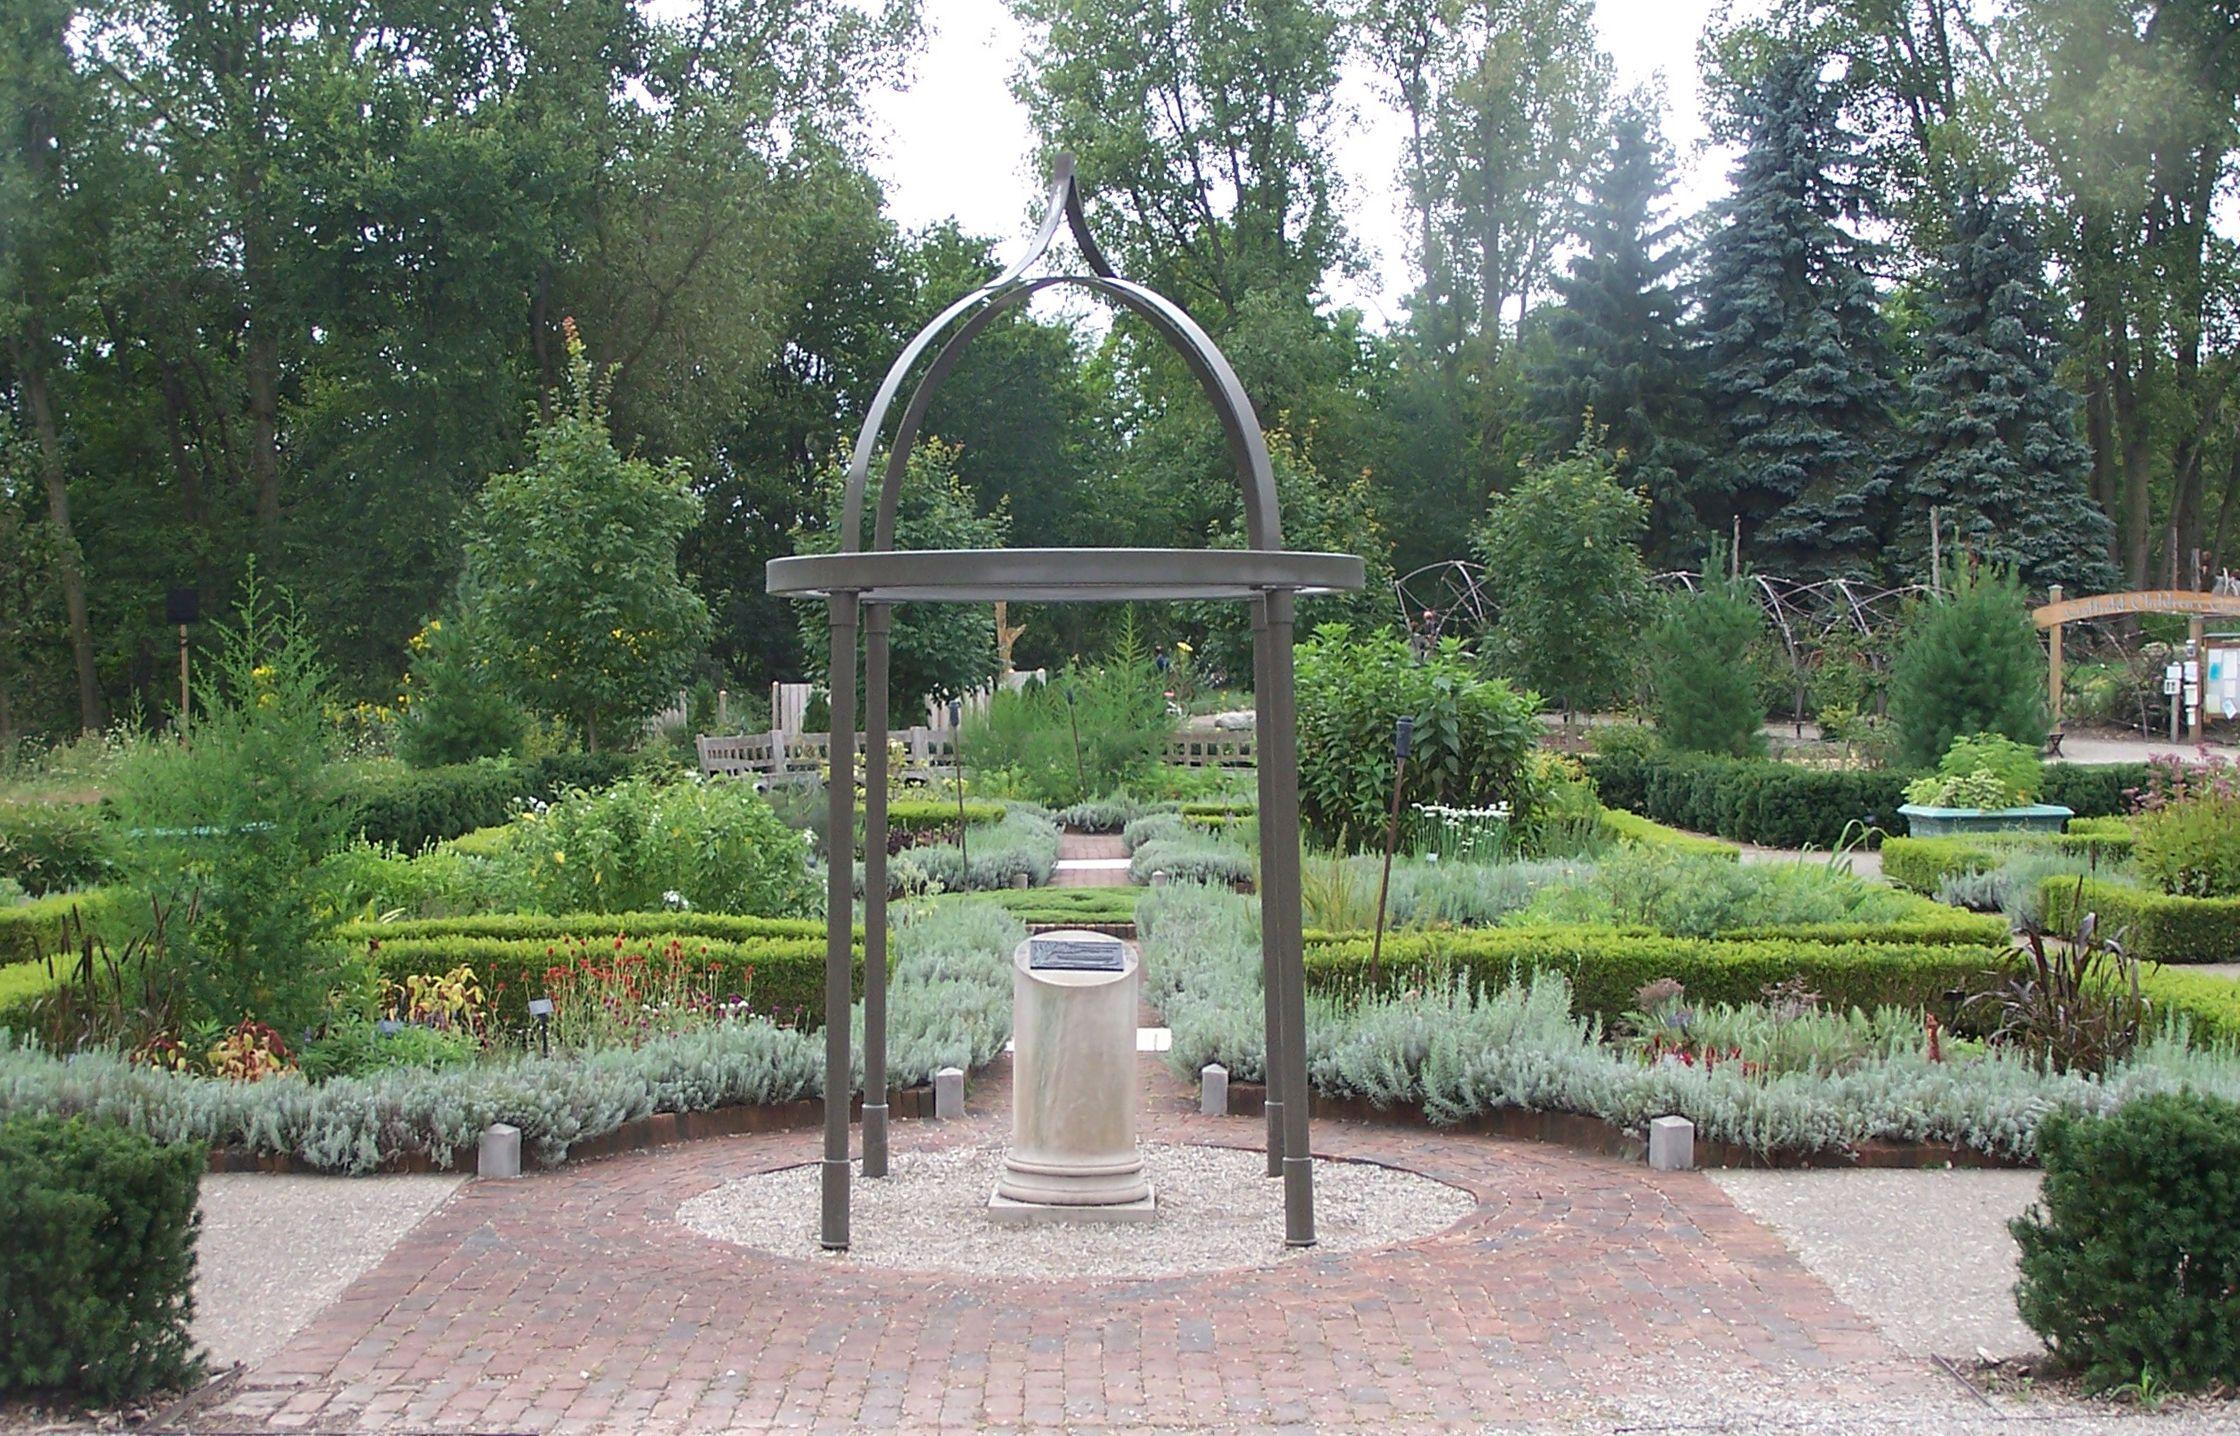 matthaei botanical gardens nichols arboretum at the university of michigan ann arbor mi - Olive Garden Ann Arbor